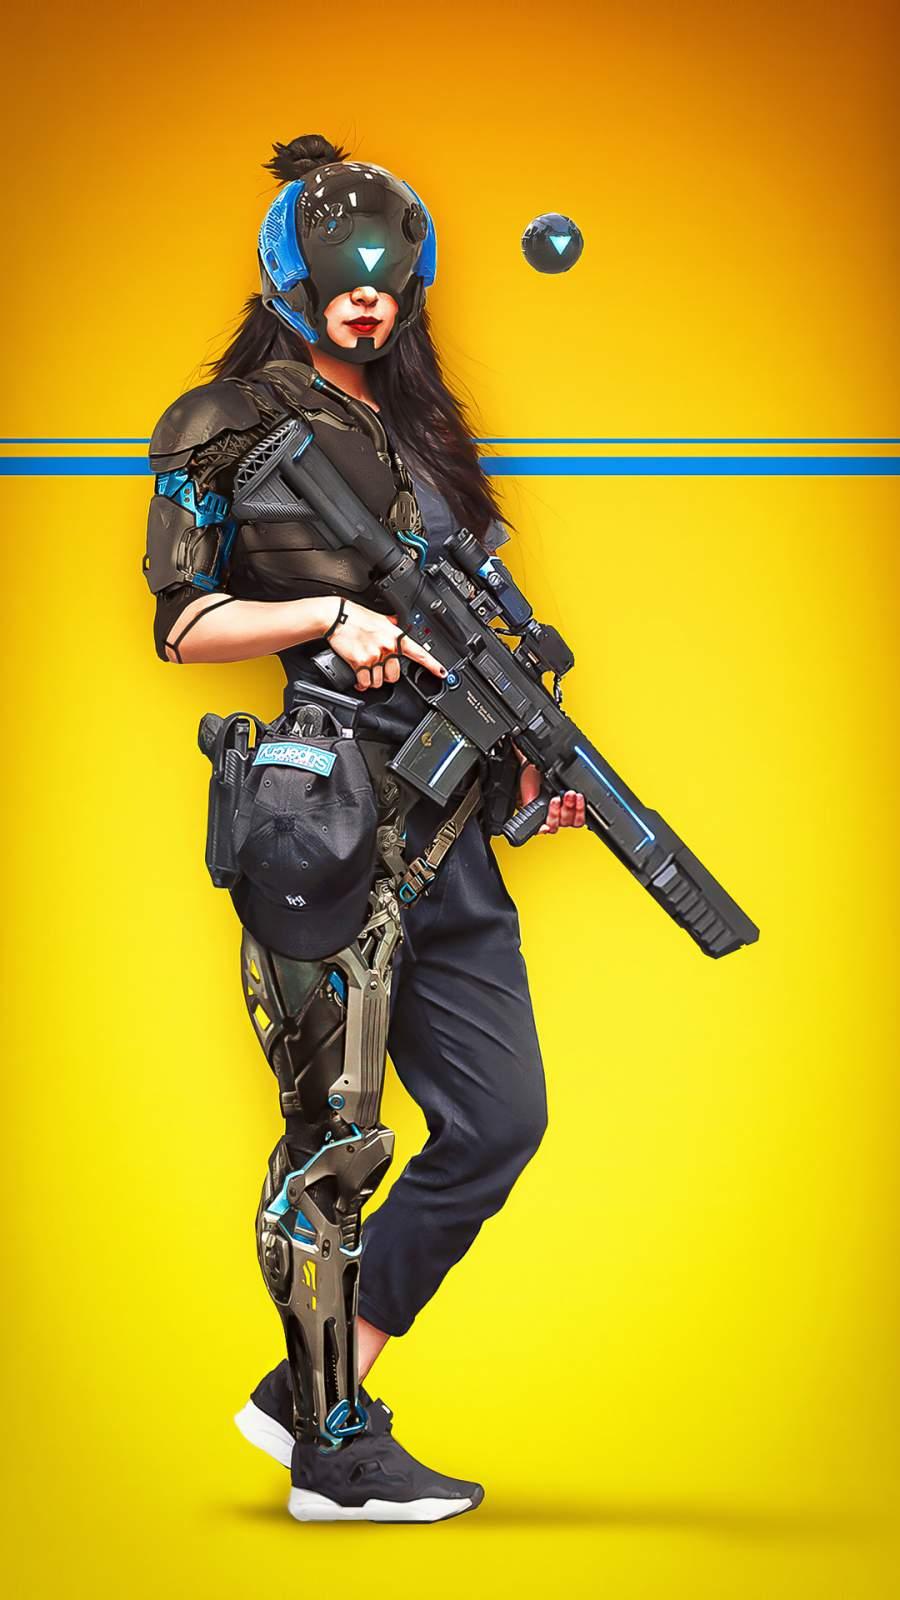 Scifi Soldier Girl iPhone Wallpaper